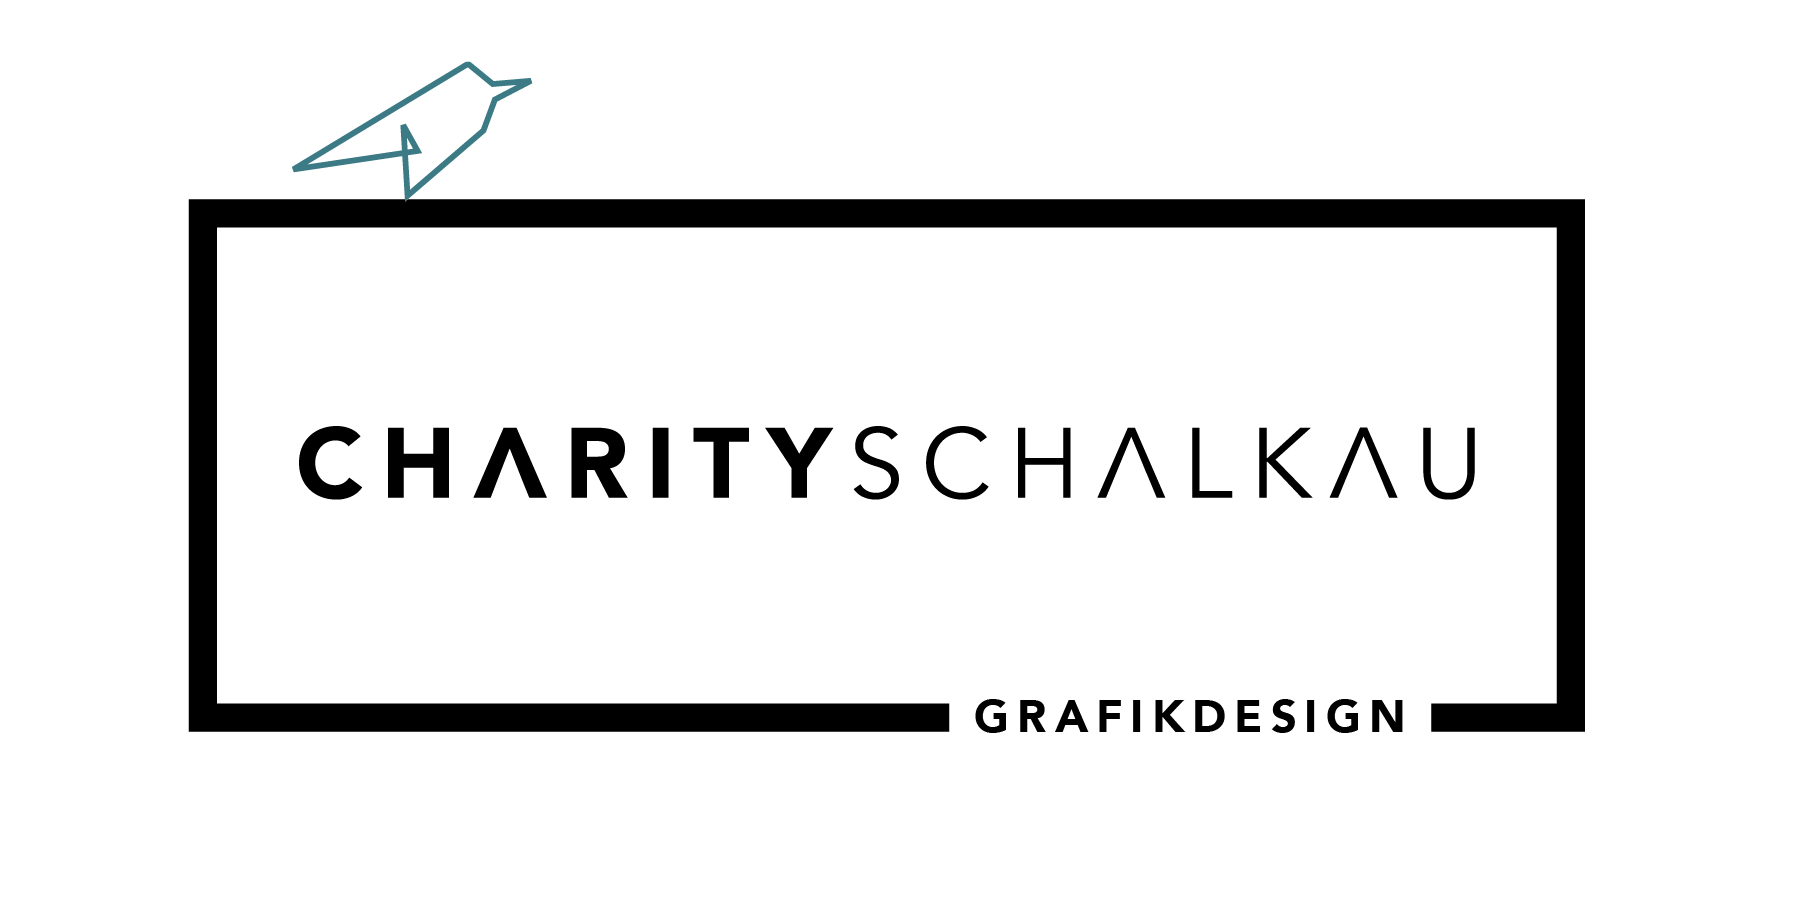 charity schalkau